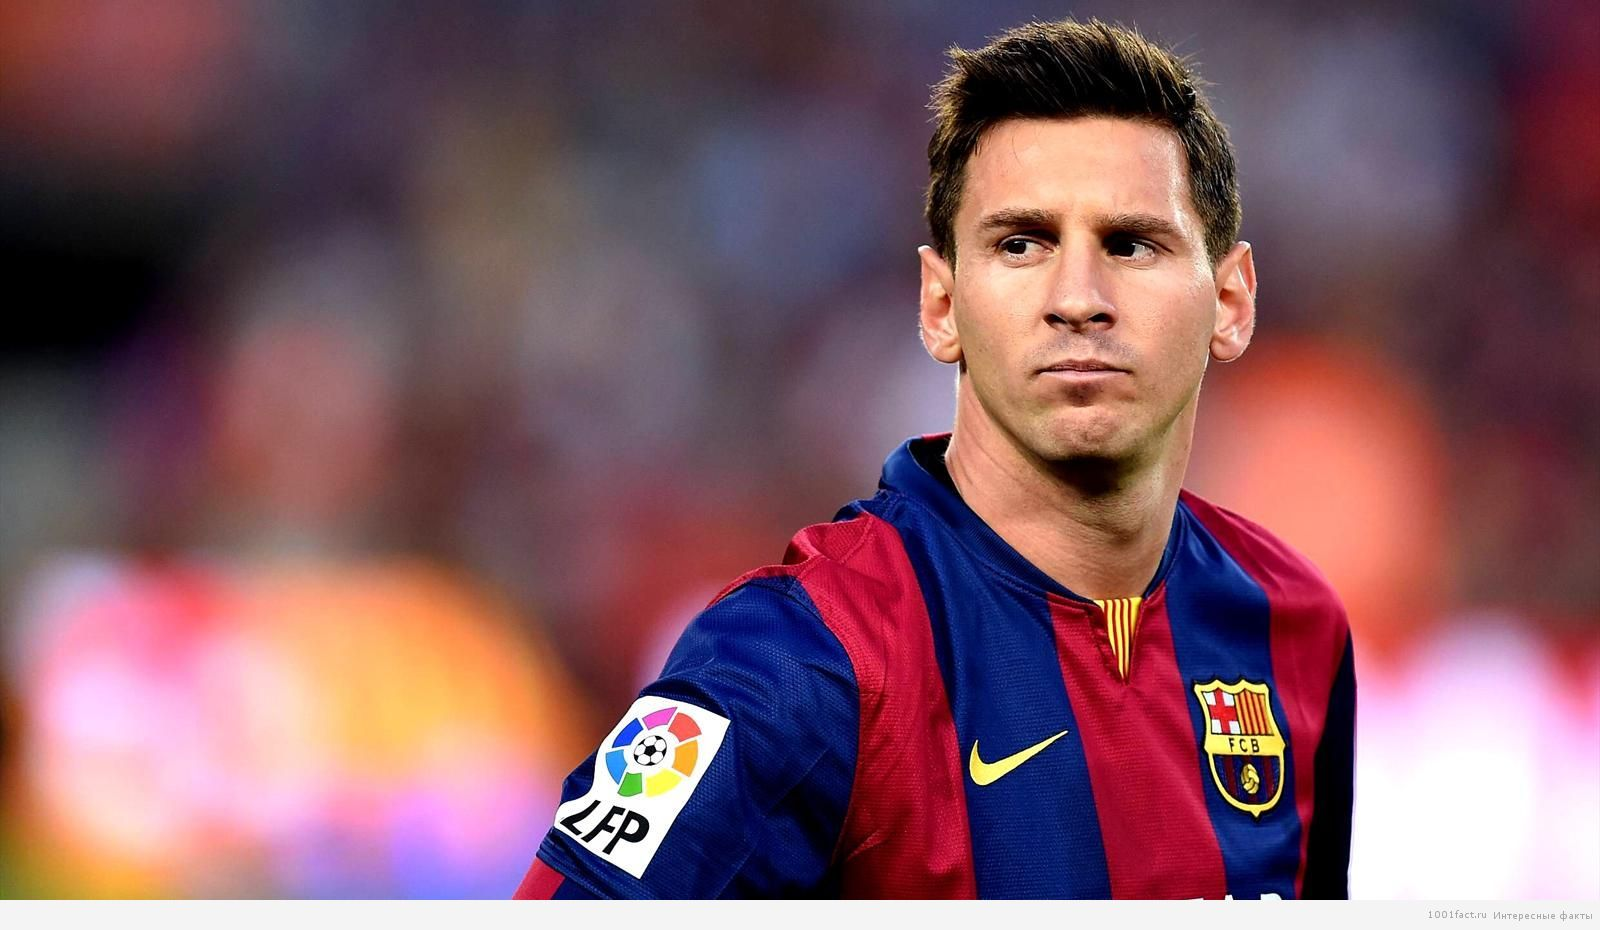 легенда футбола Месси